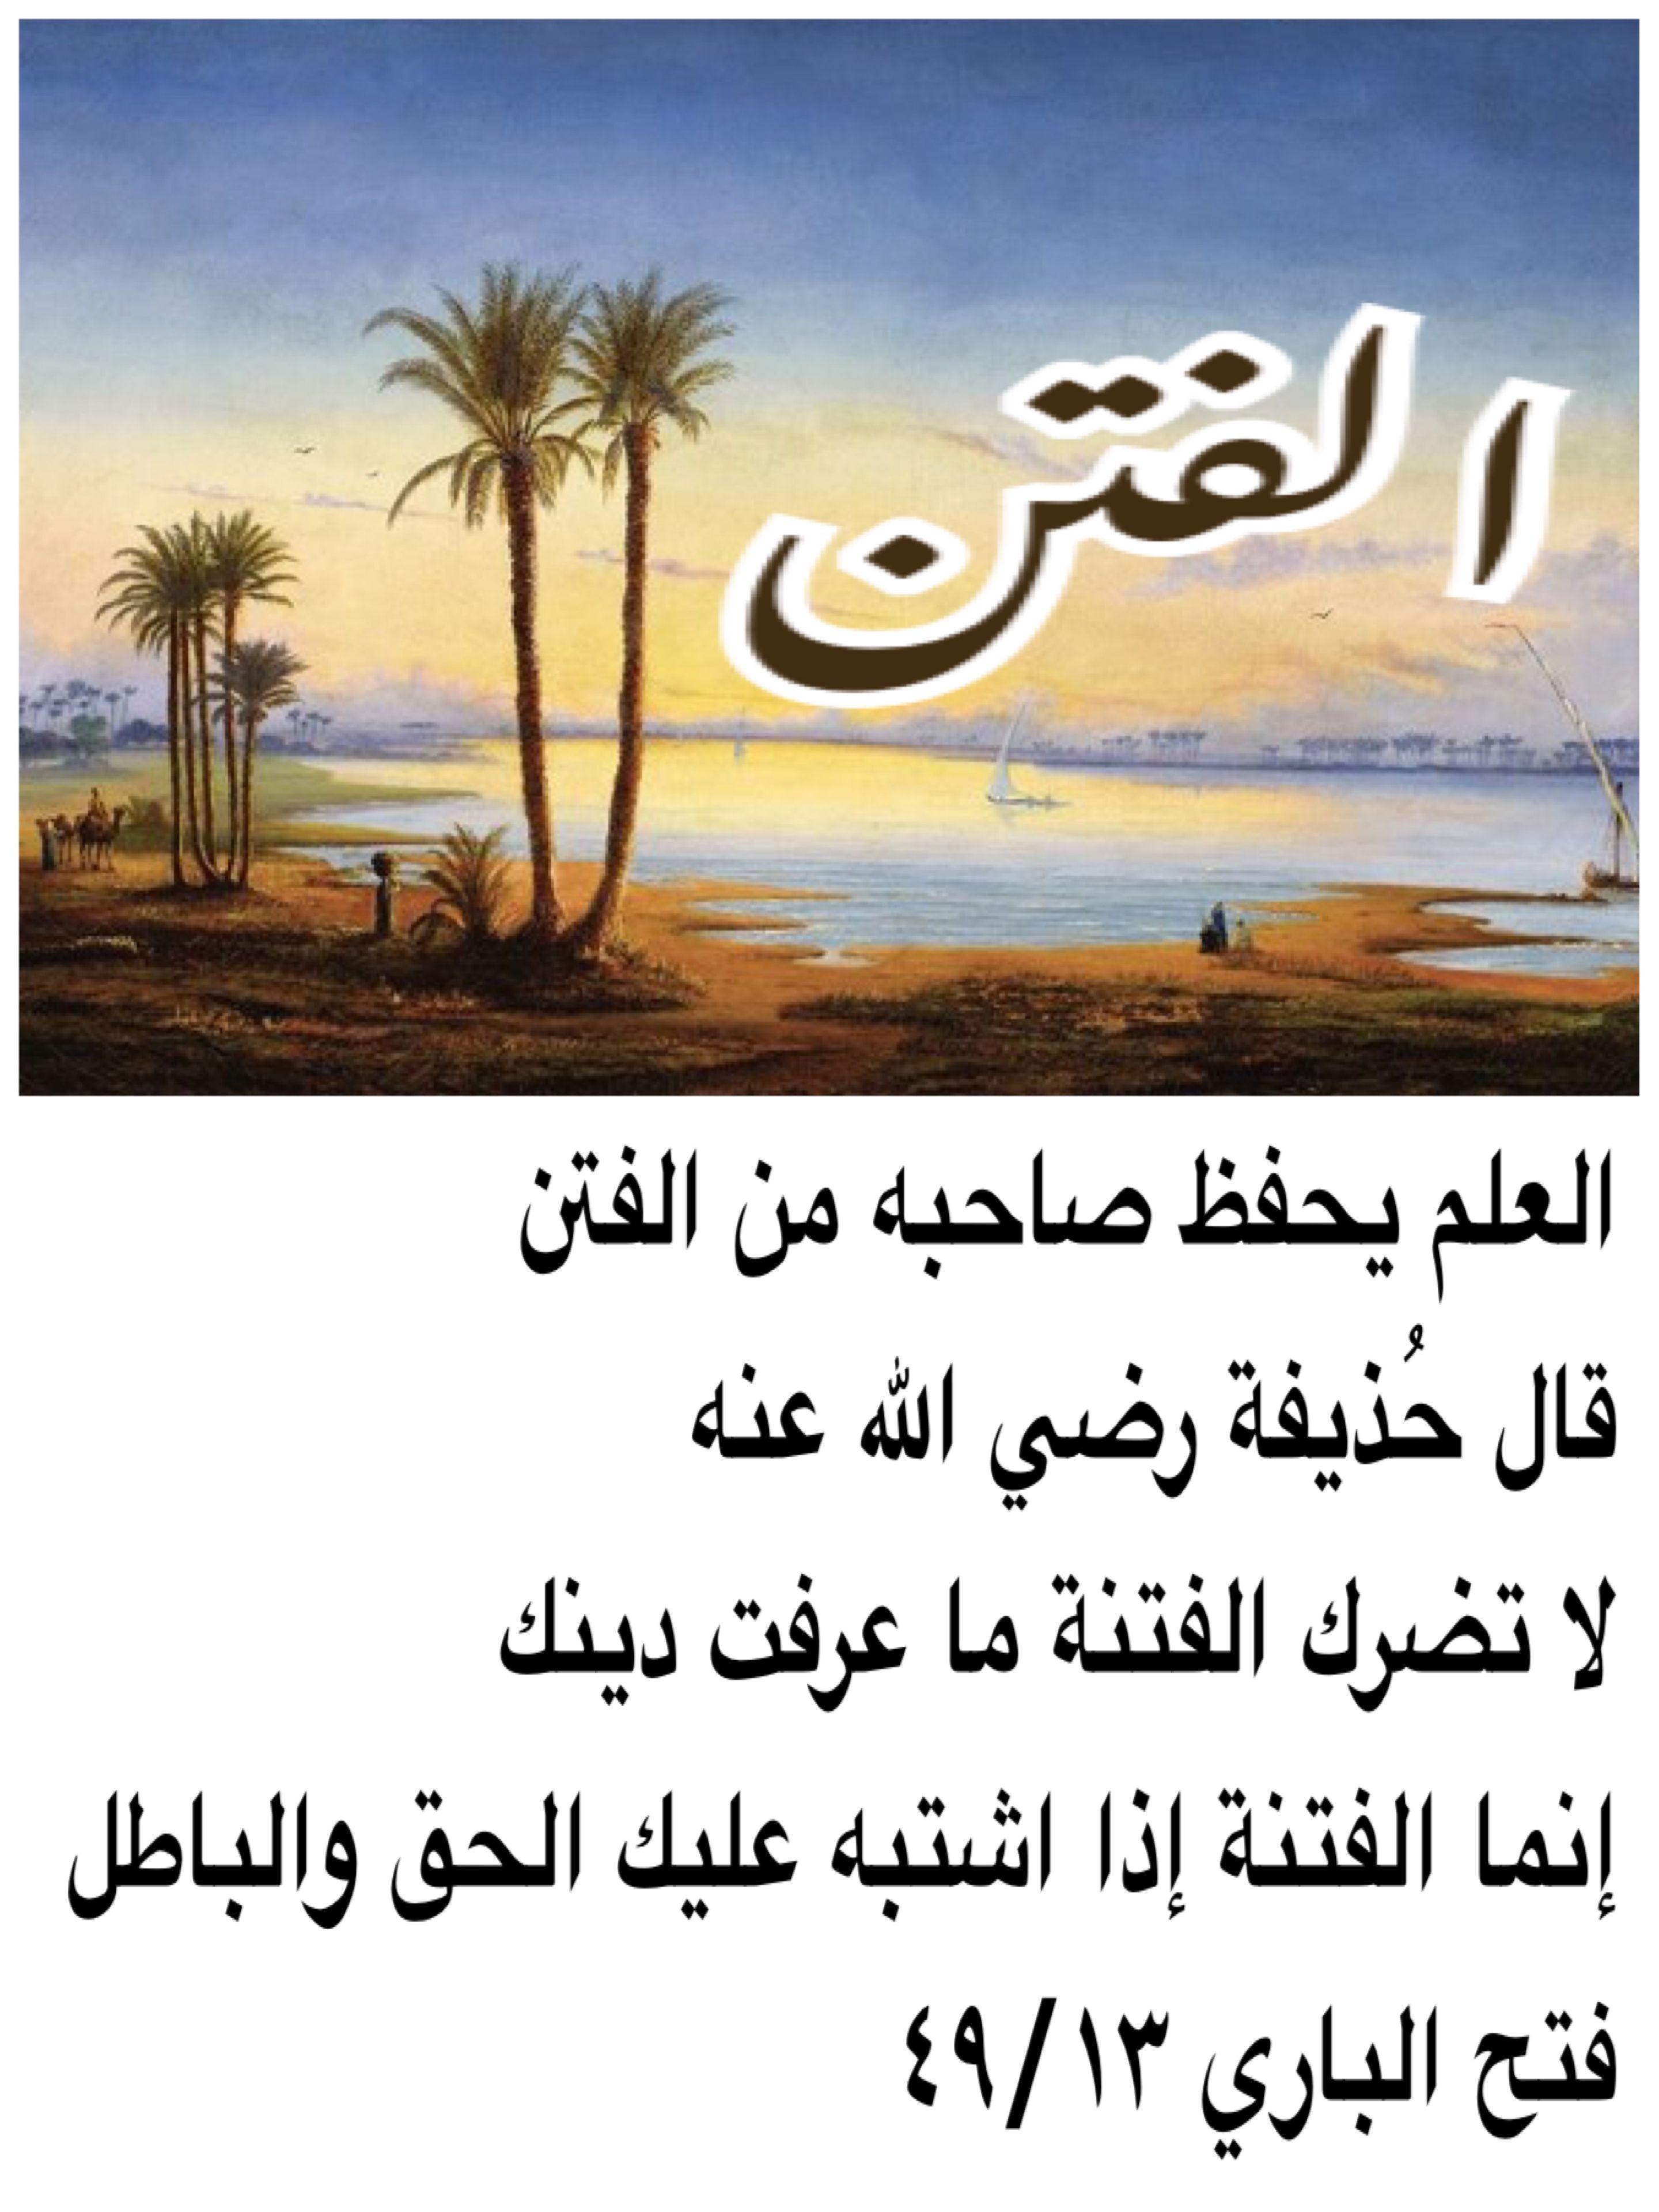 Pin By يحيى تركو On حديث Arabic Calligraphy Words Calligraphy